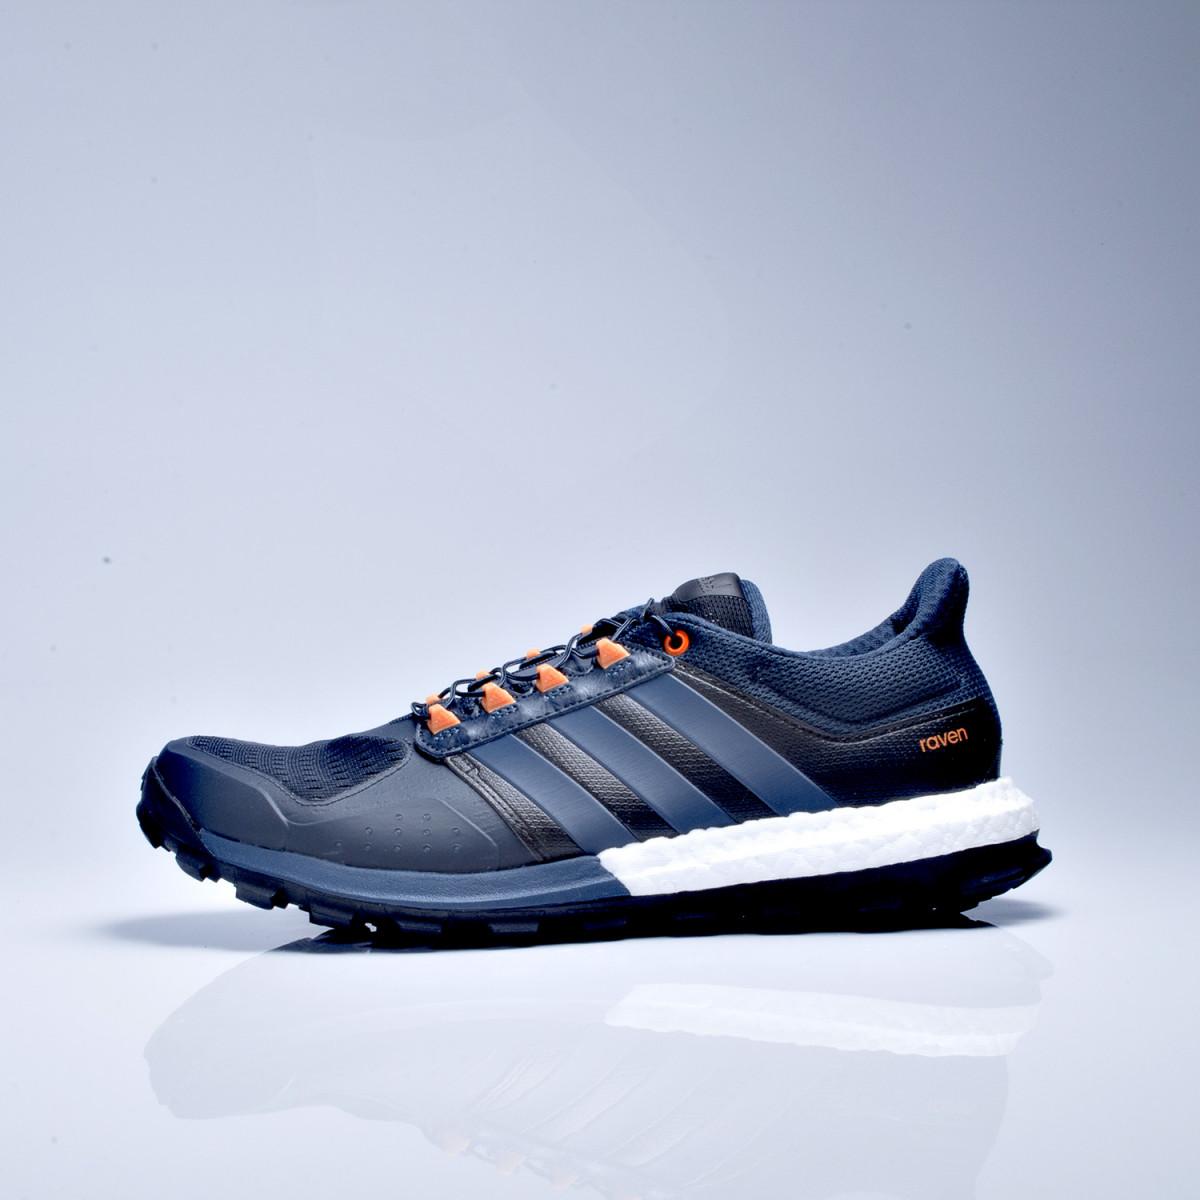 Zapatillas Adidas Raven